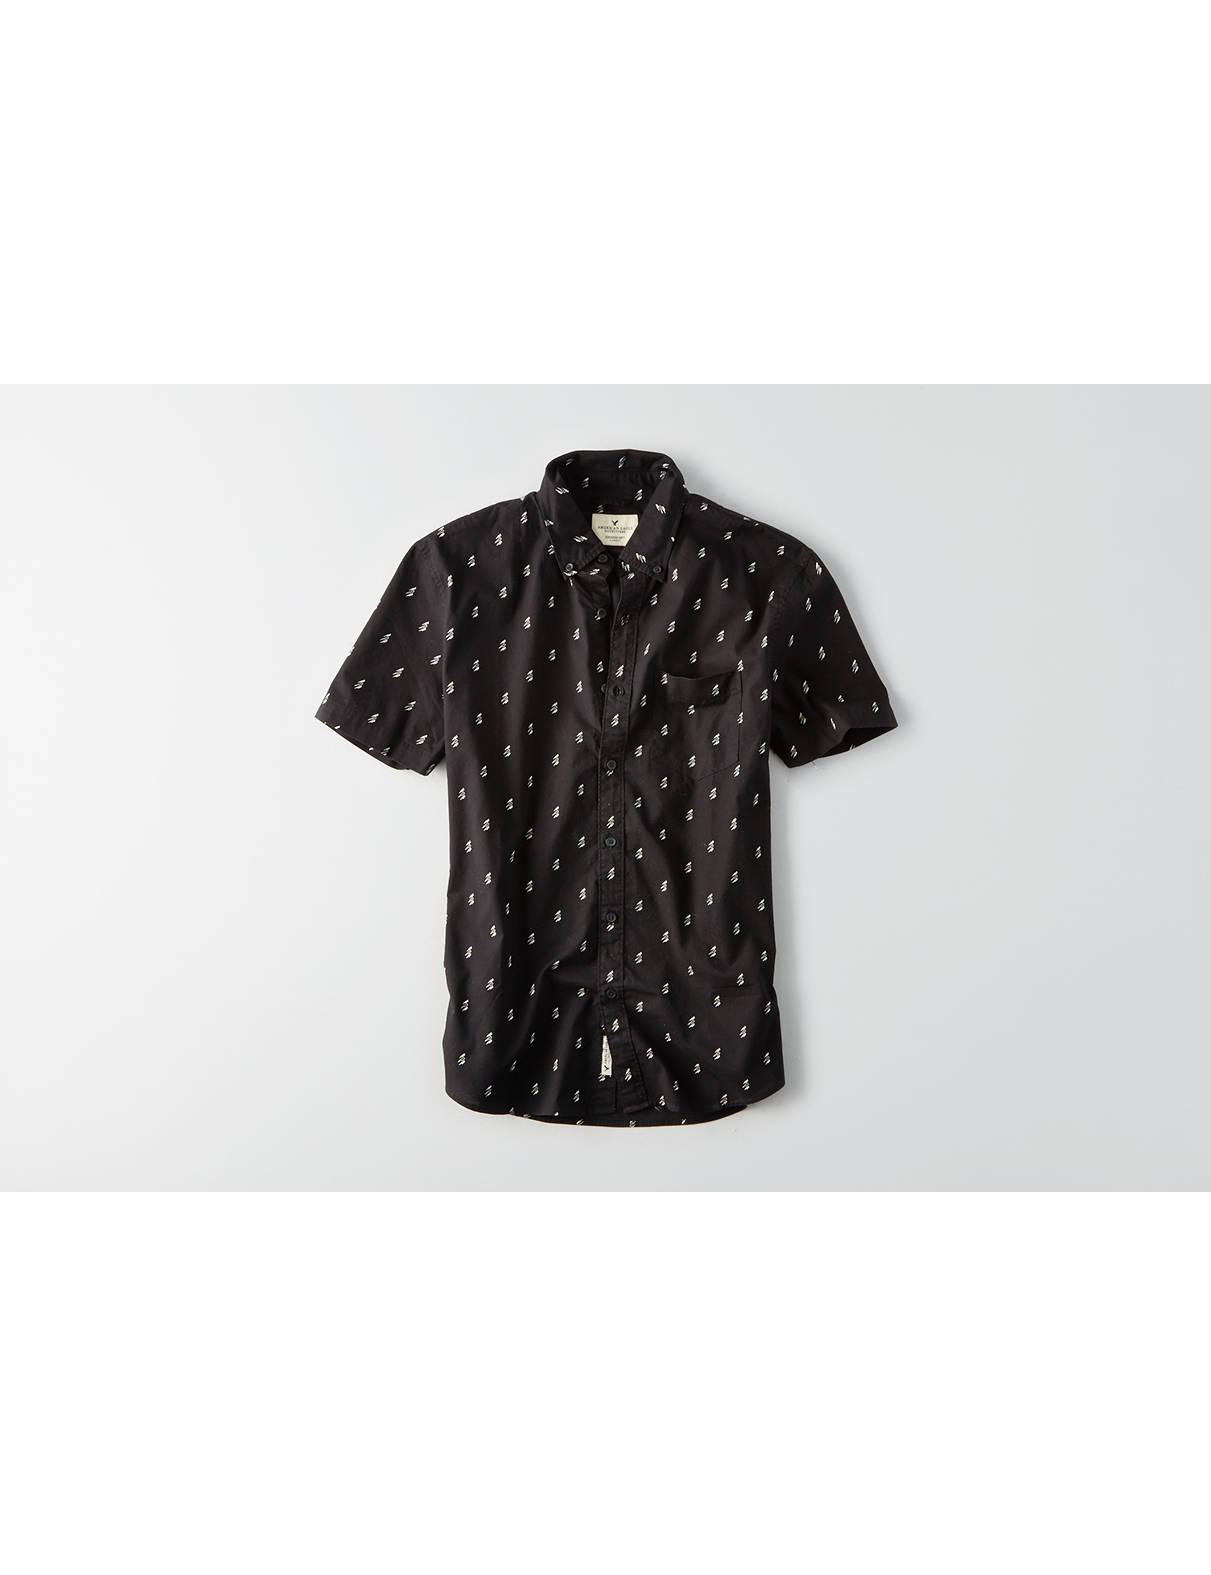 Shirt design on sleeve - Display Product Reviews For Aeo Short Sleeve Print Poplin Shirt